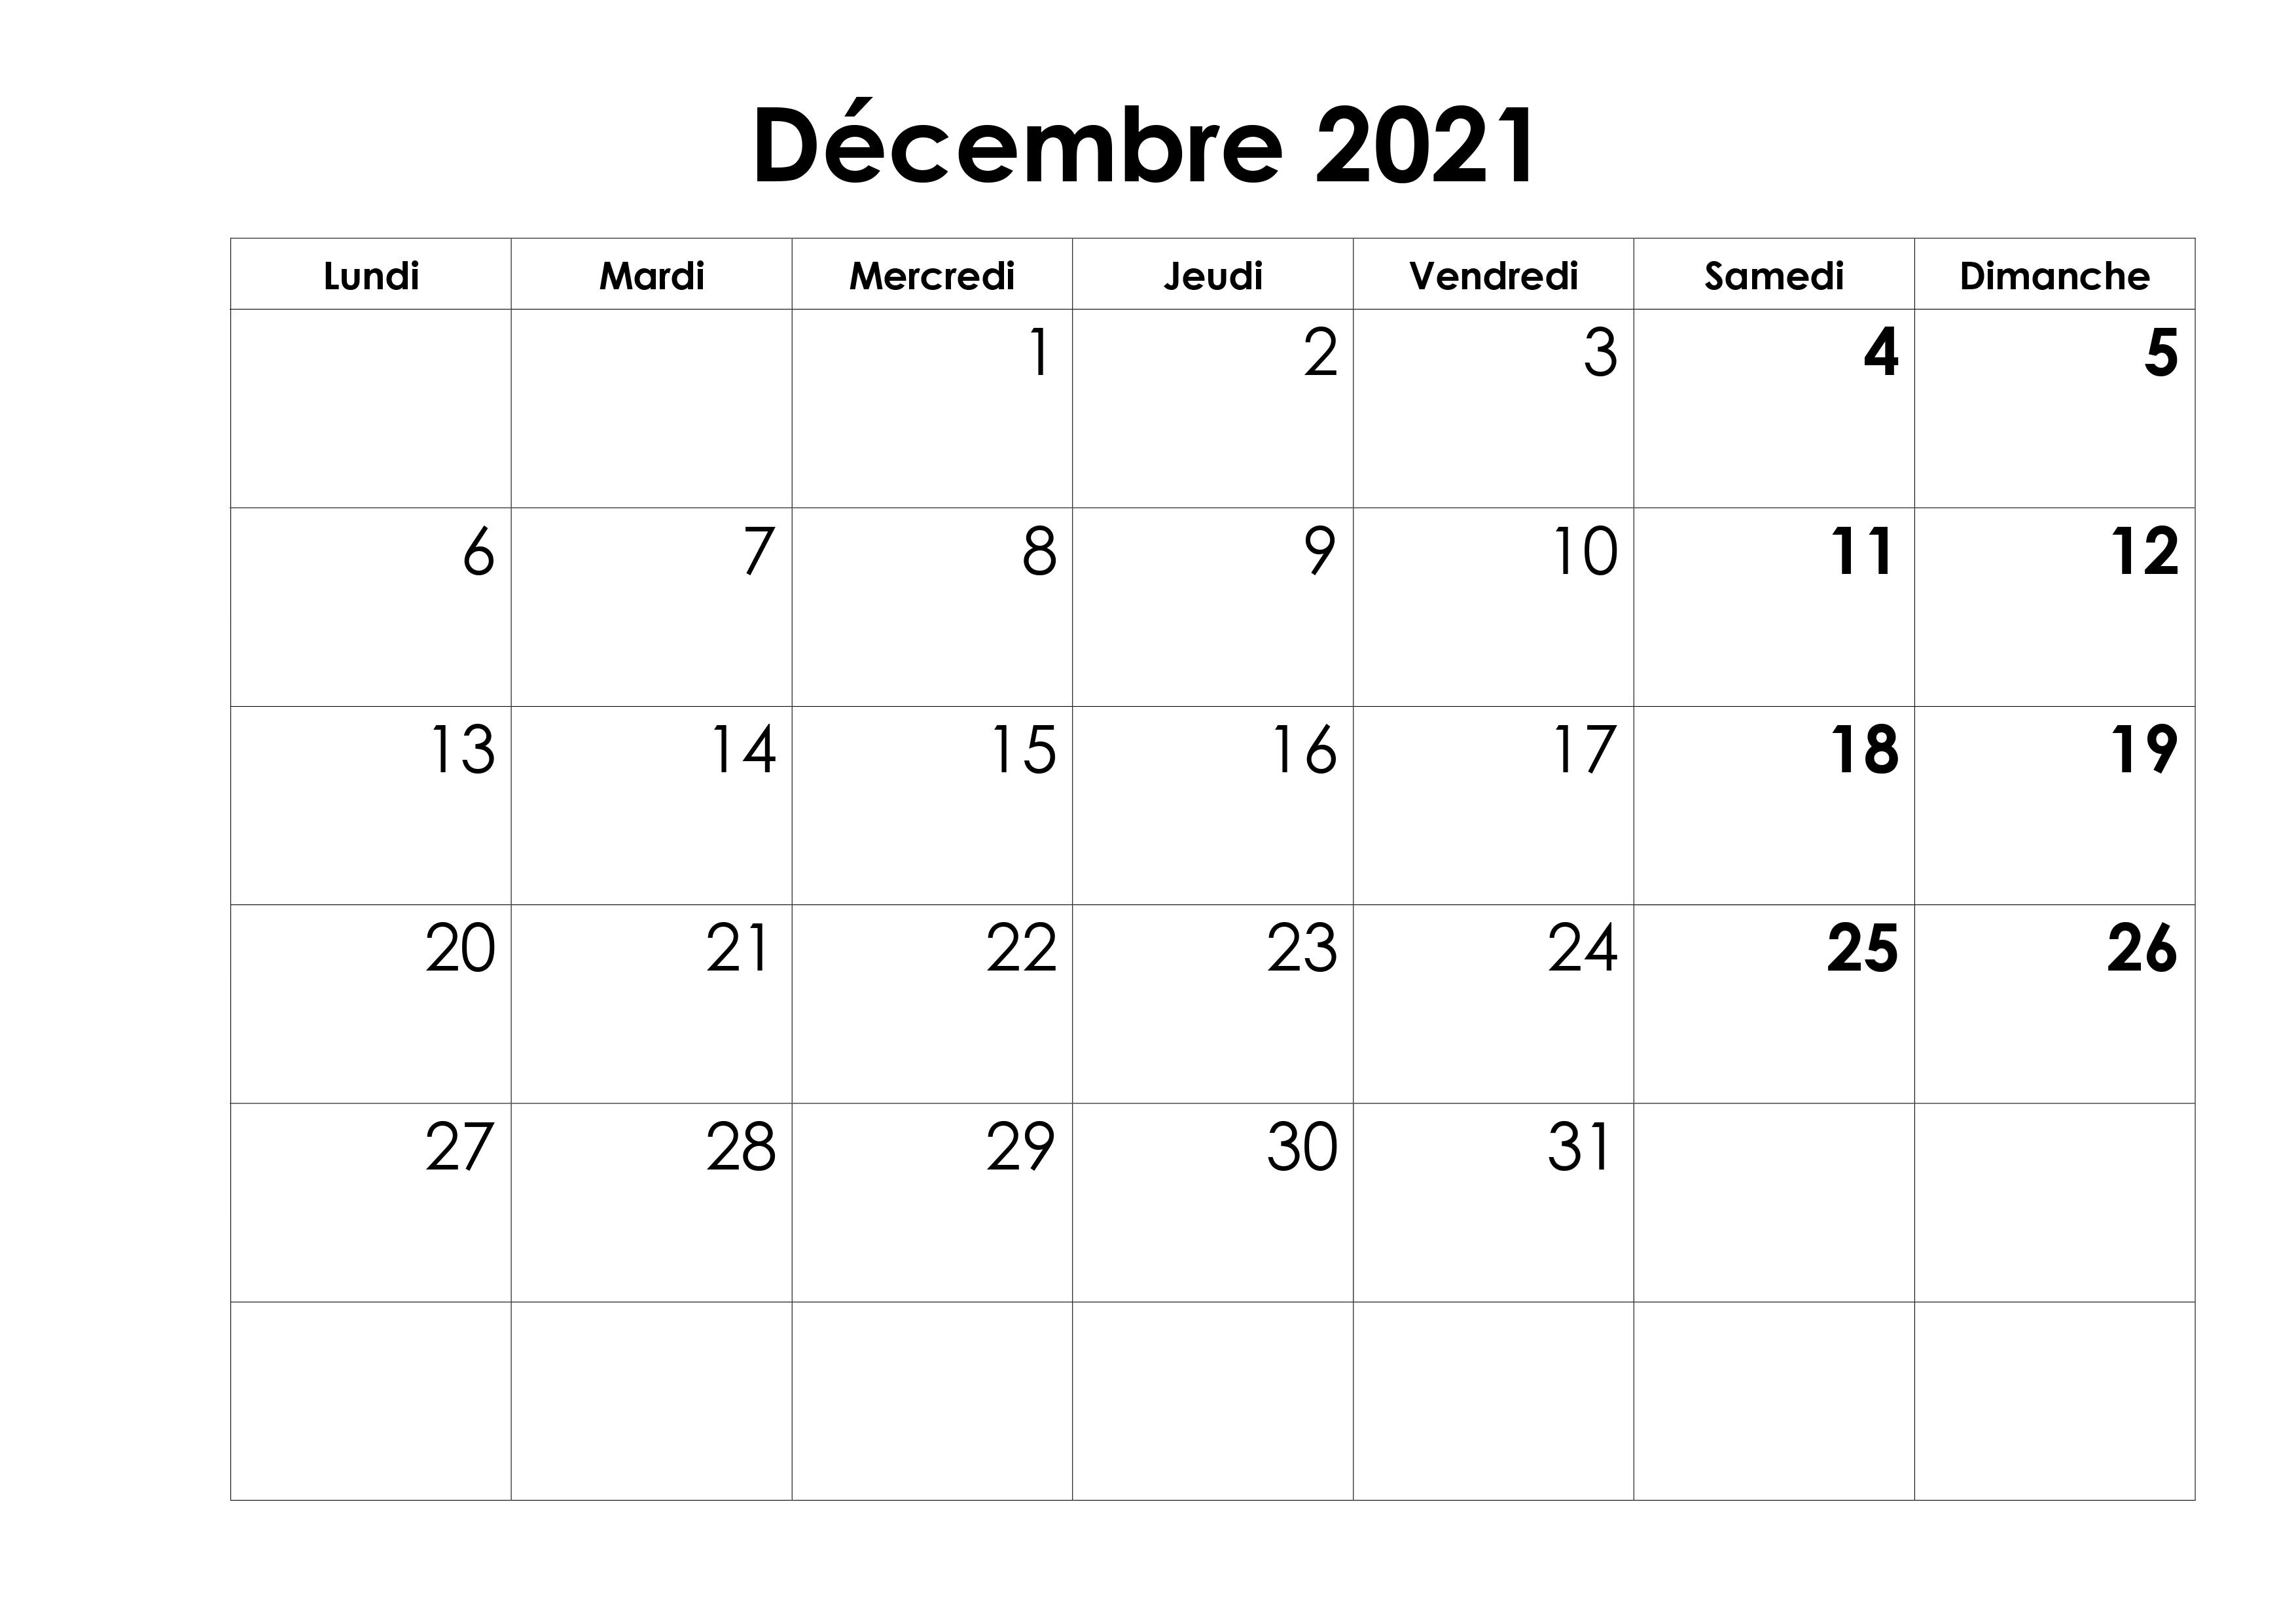 Decembre Vacances 2021 Calendrier